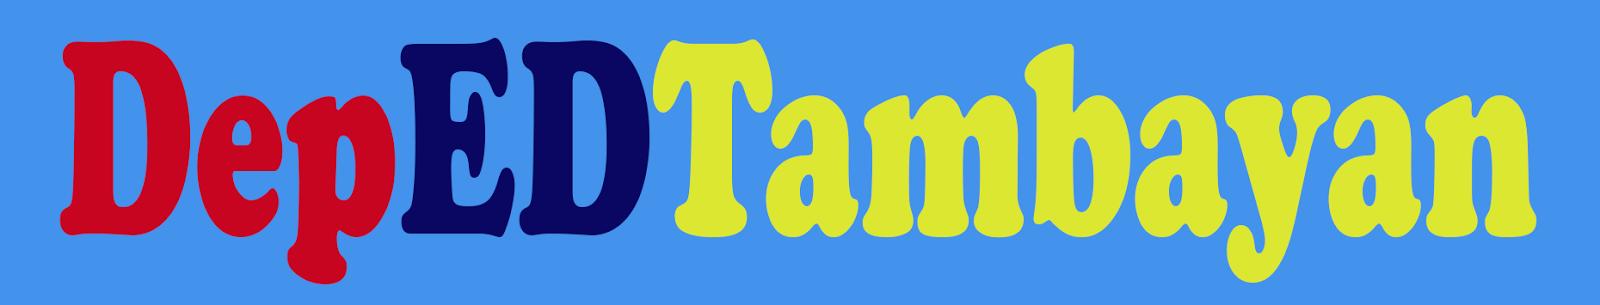 DEPED TAMBAYAN HOME